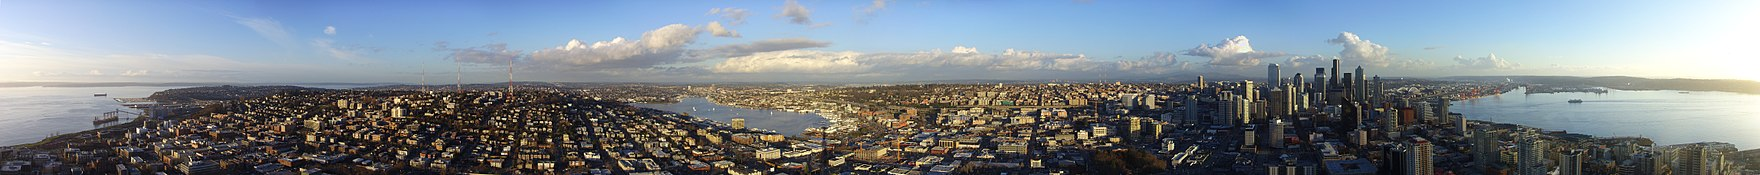 lesbiennes rencontres Seattle WA Orlando conducteur ramper vitesse datant